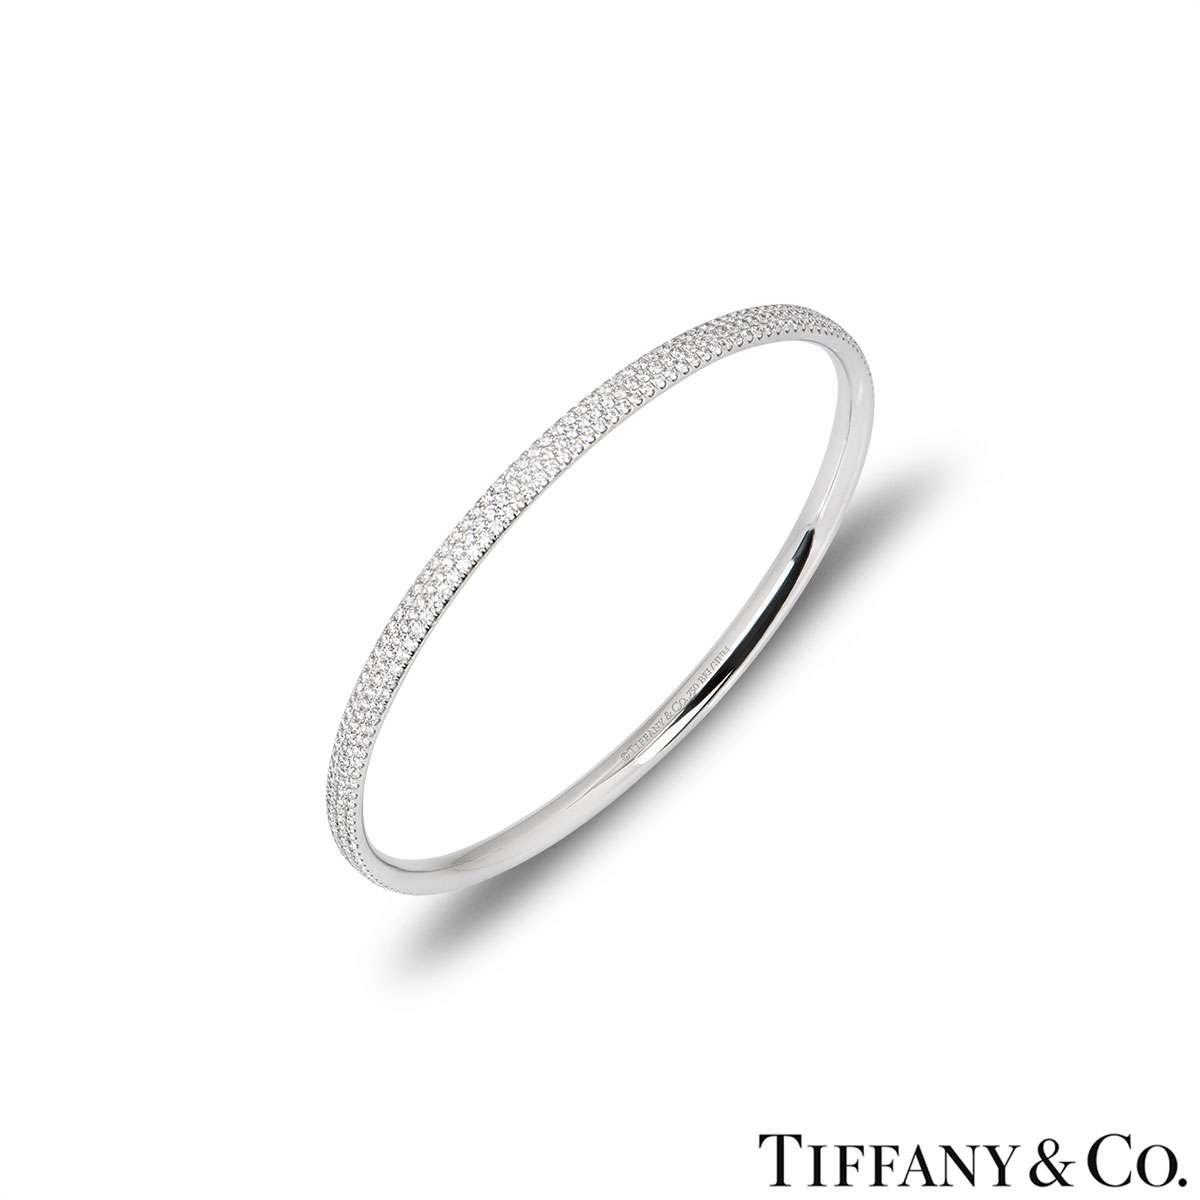 Tiffany & Co. White Gold Diamond Bangle